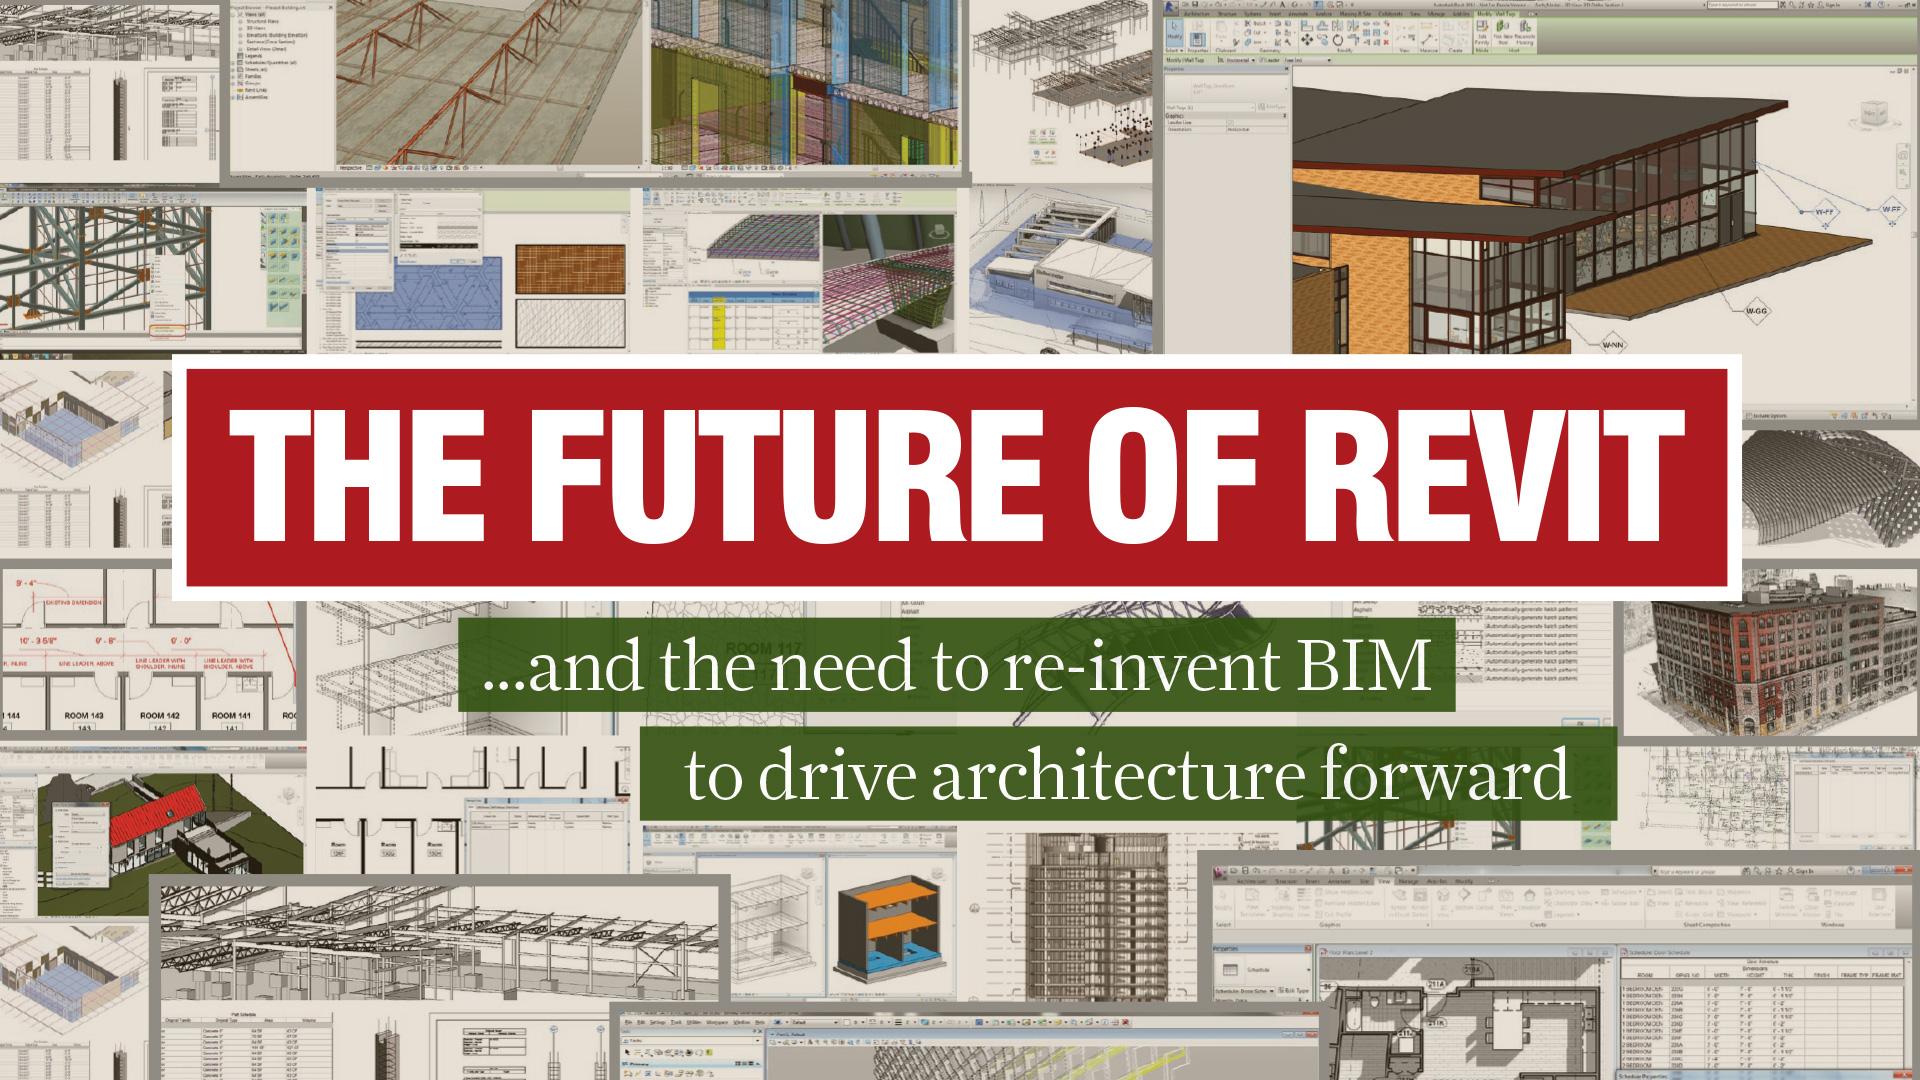 The future of Revit